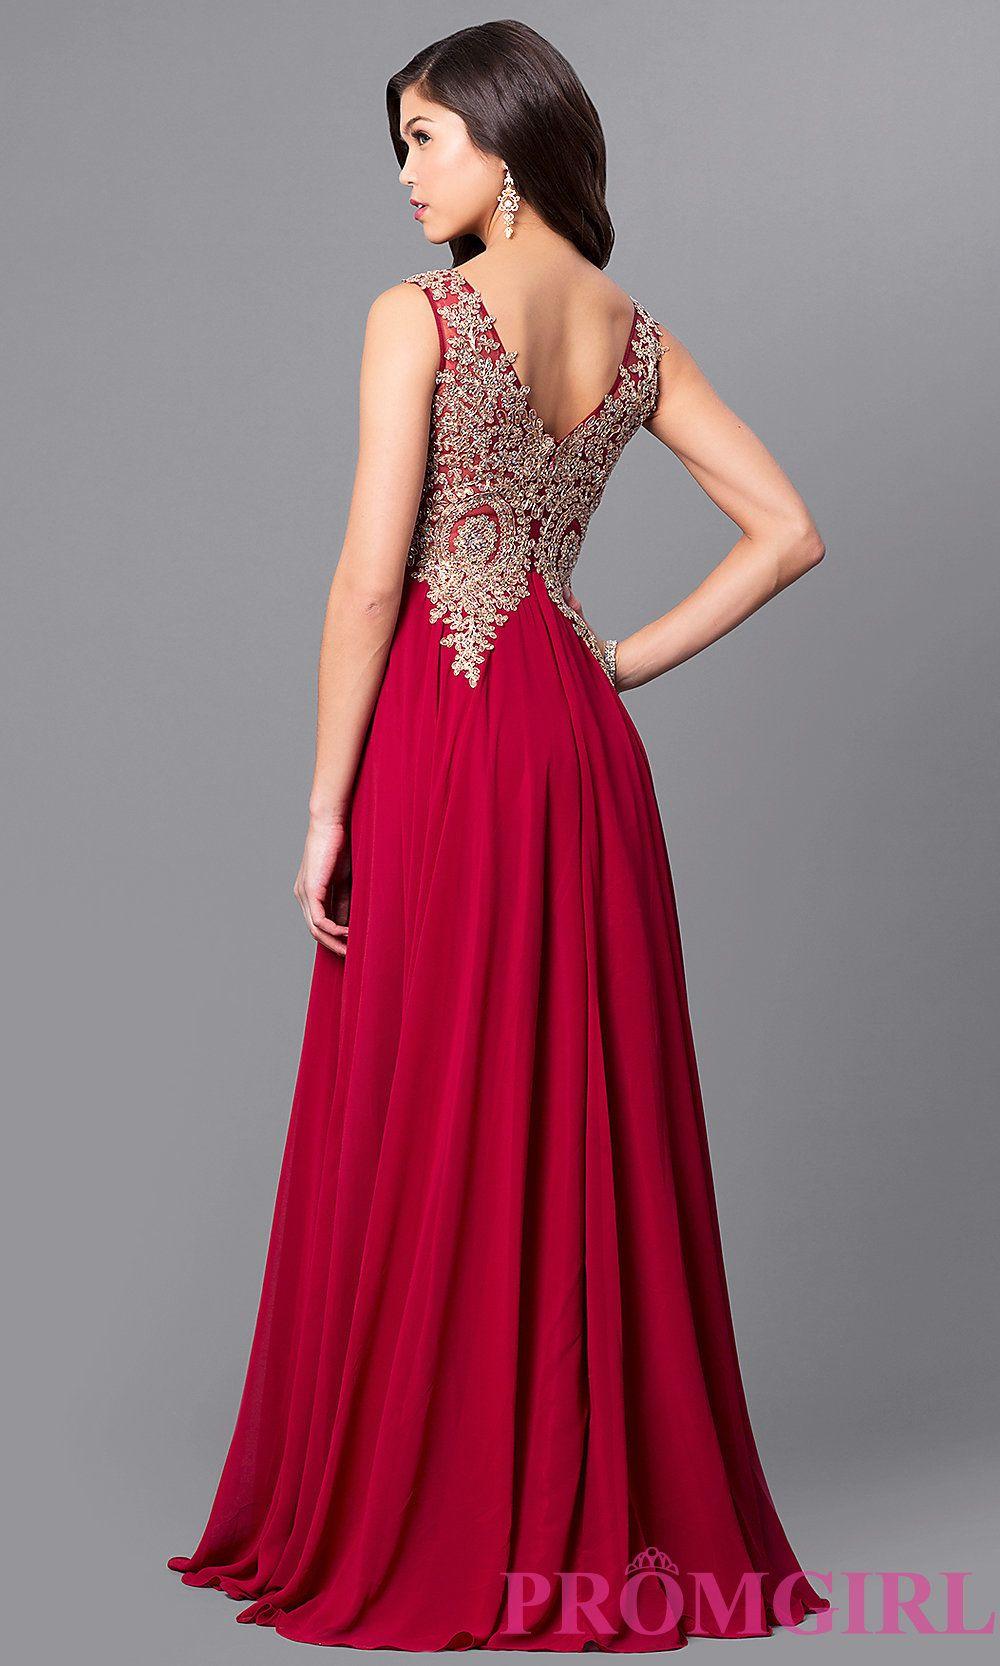 I like style fbgl from promgirl do you like vestidos